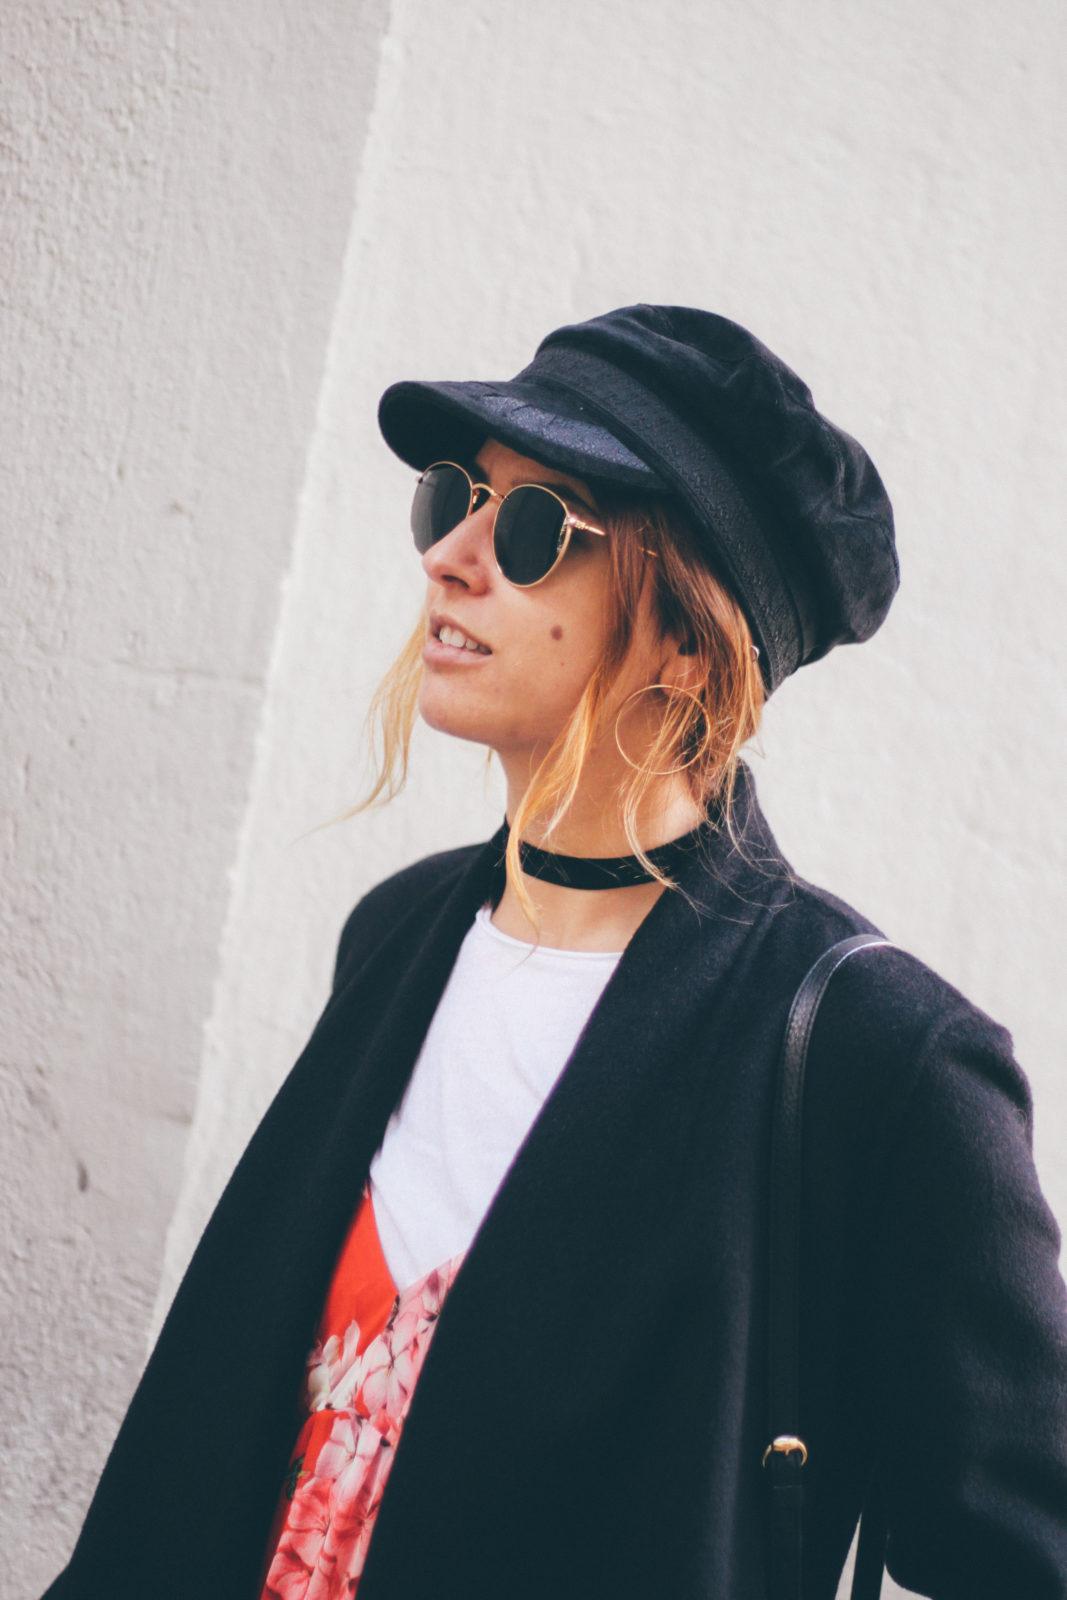 baker_boy_hat_vestido_con_camiseta_gorra_marinera_botines_hebillas_fall_2016_trends_street_style_outfits_donkeycool-28